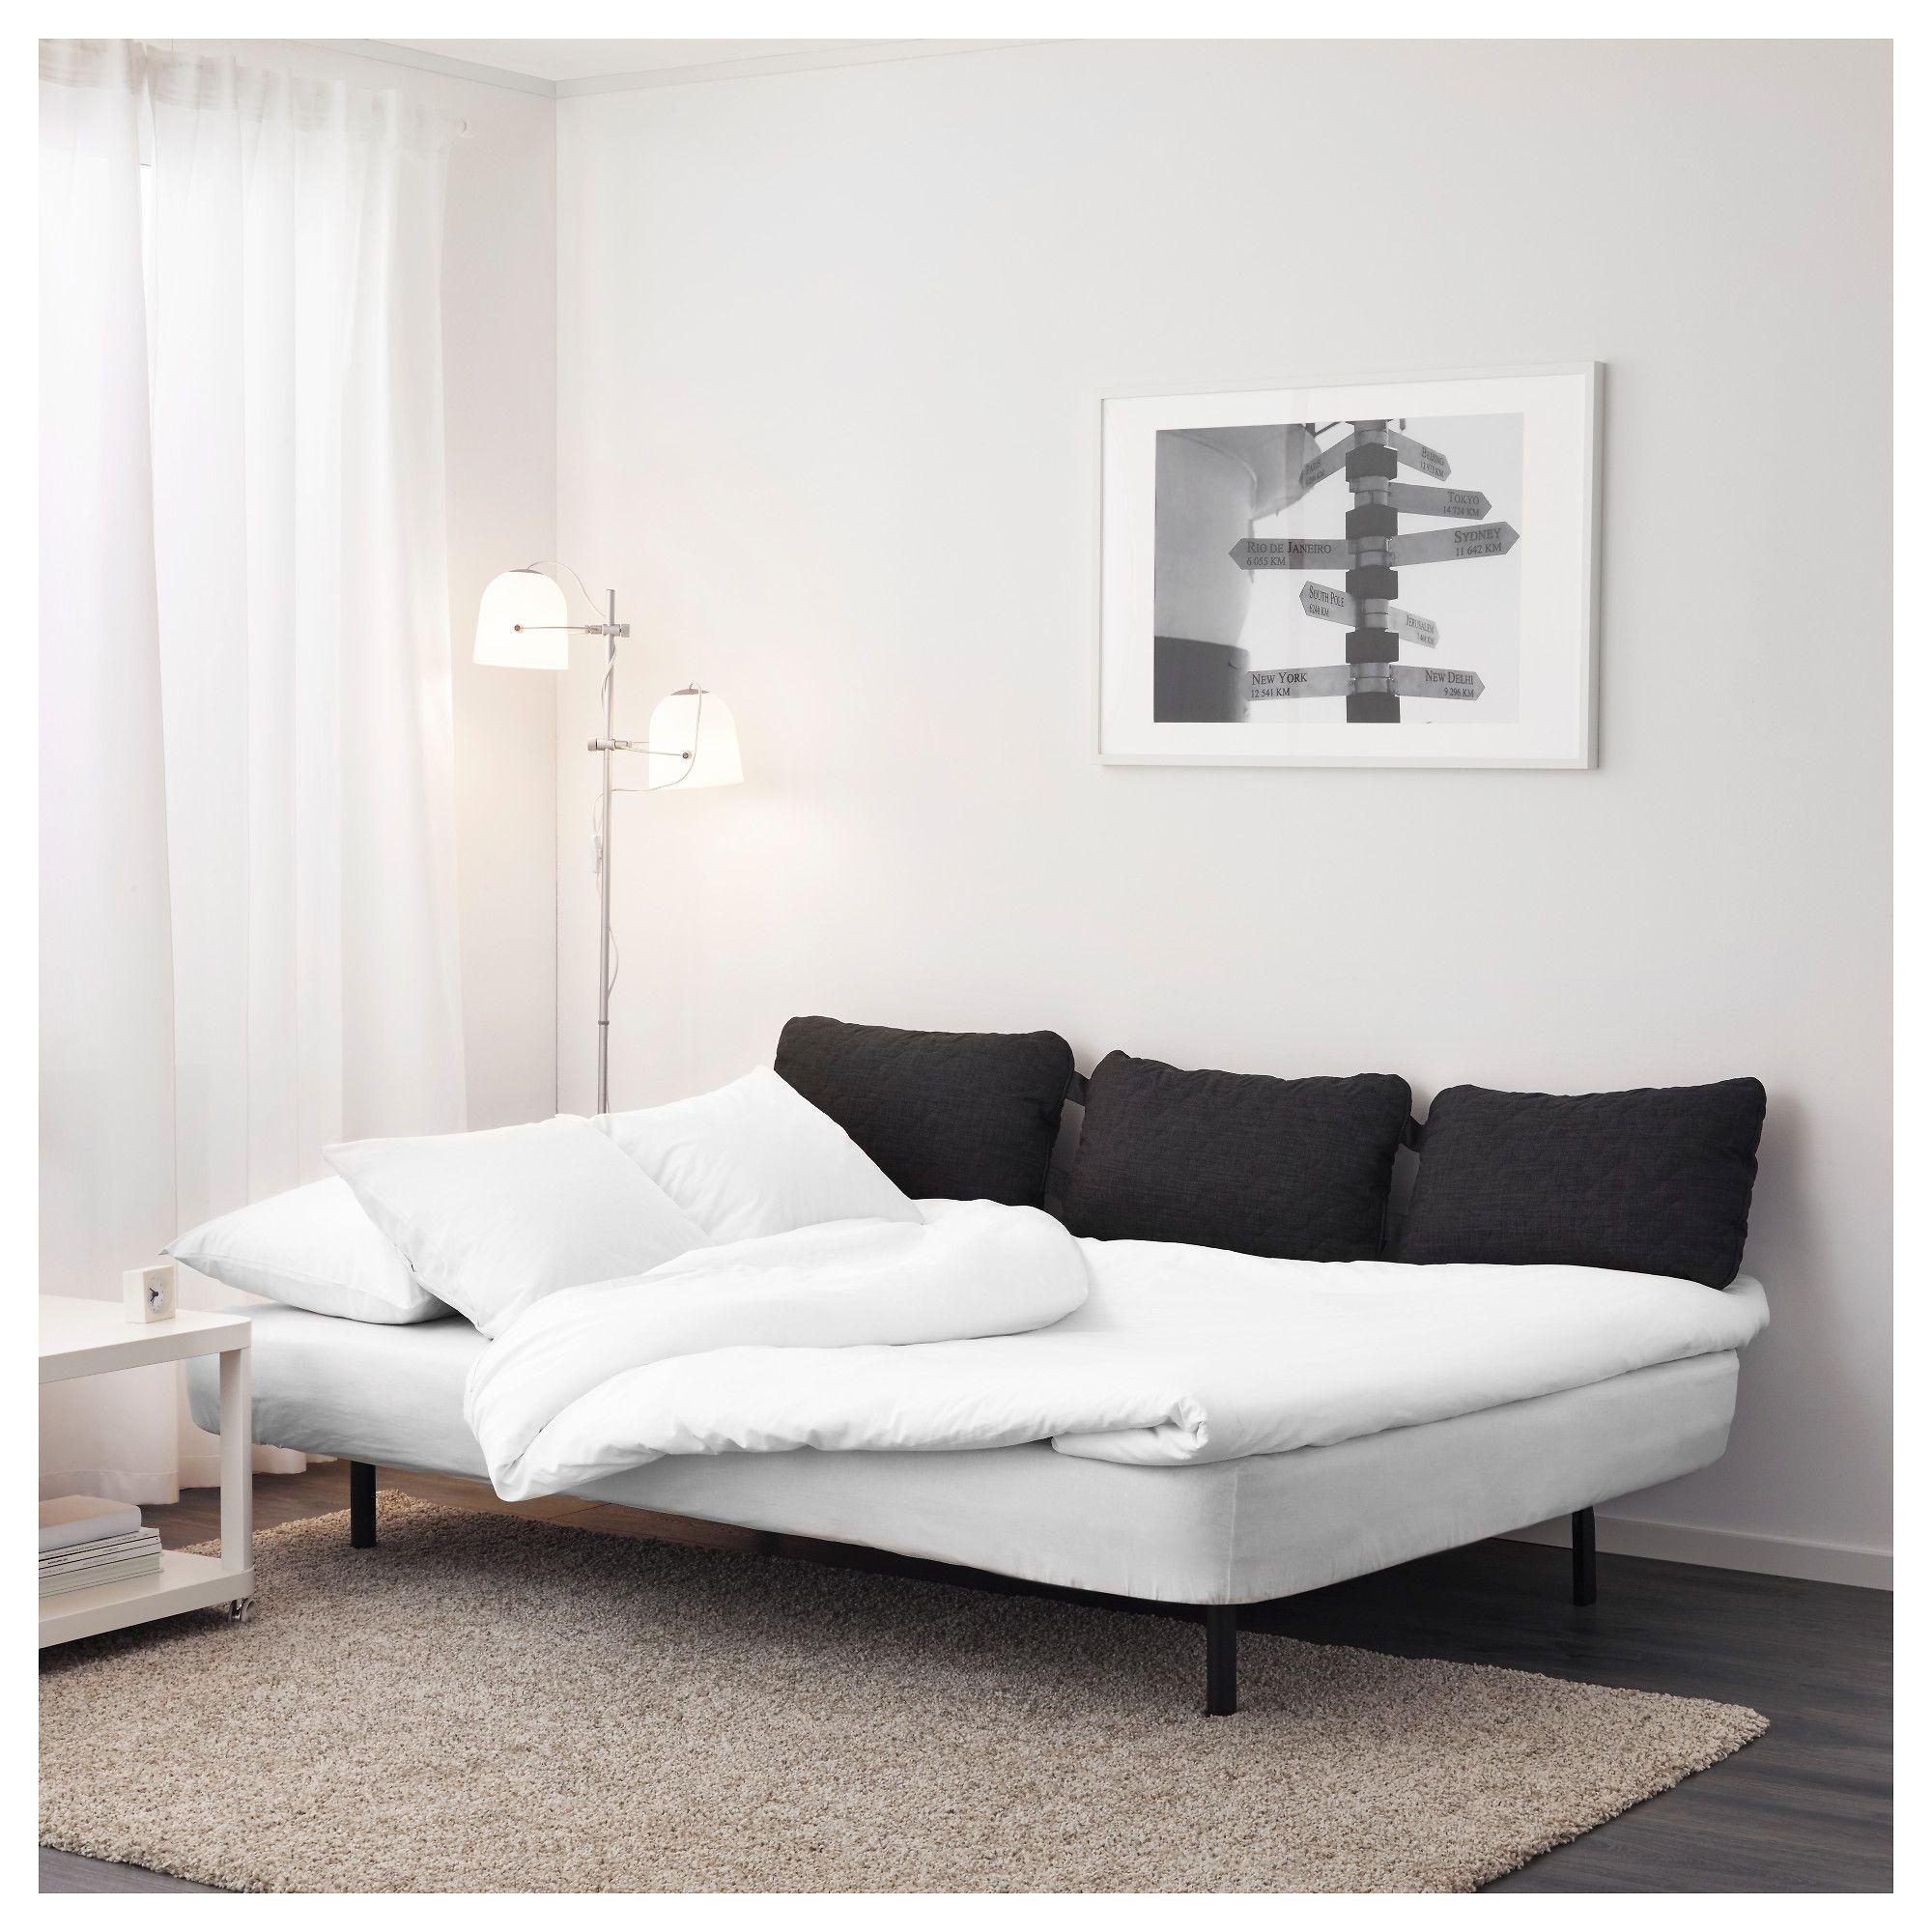 IKEA NYHAMN Futon with pocket spring mattress, Knisa